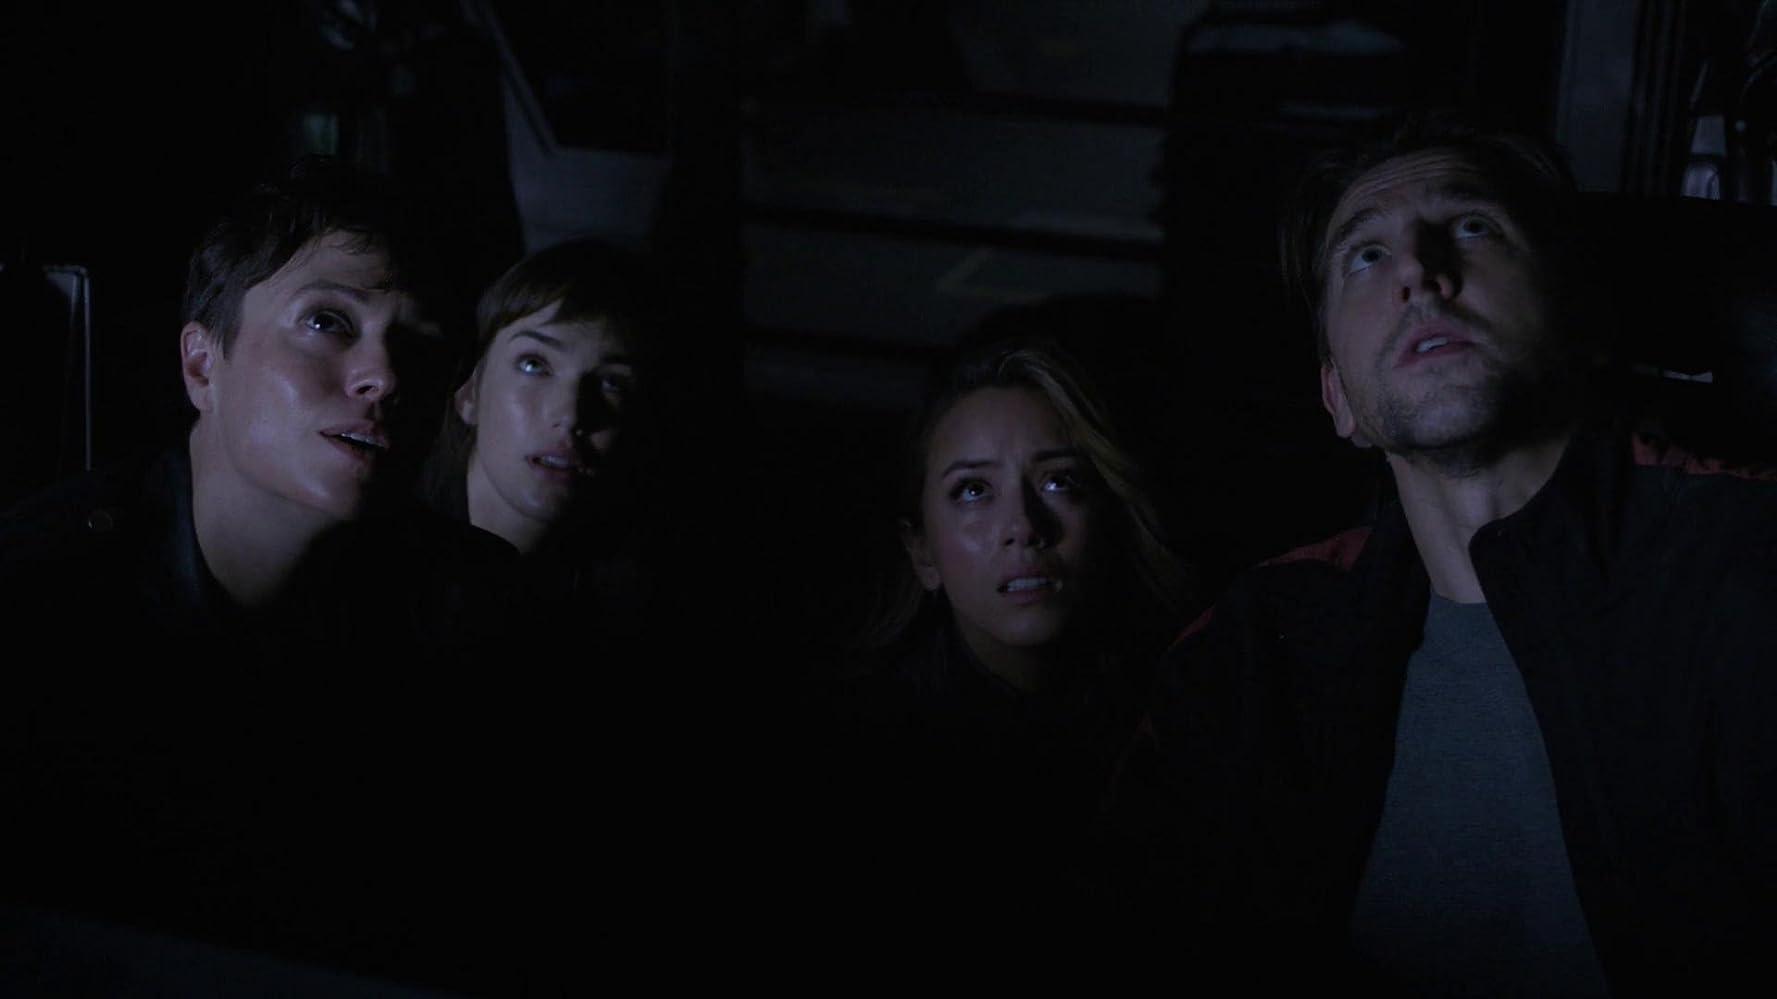 Maximilian Osinski, Briana Venskus, Chloe Bennet, and Elizabeth Henstridge in Agents of S.H.I.E.L.D. (2013)